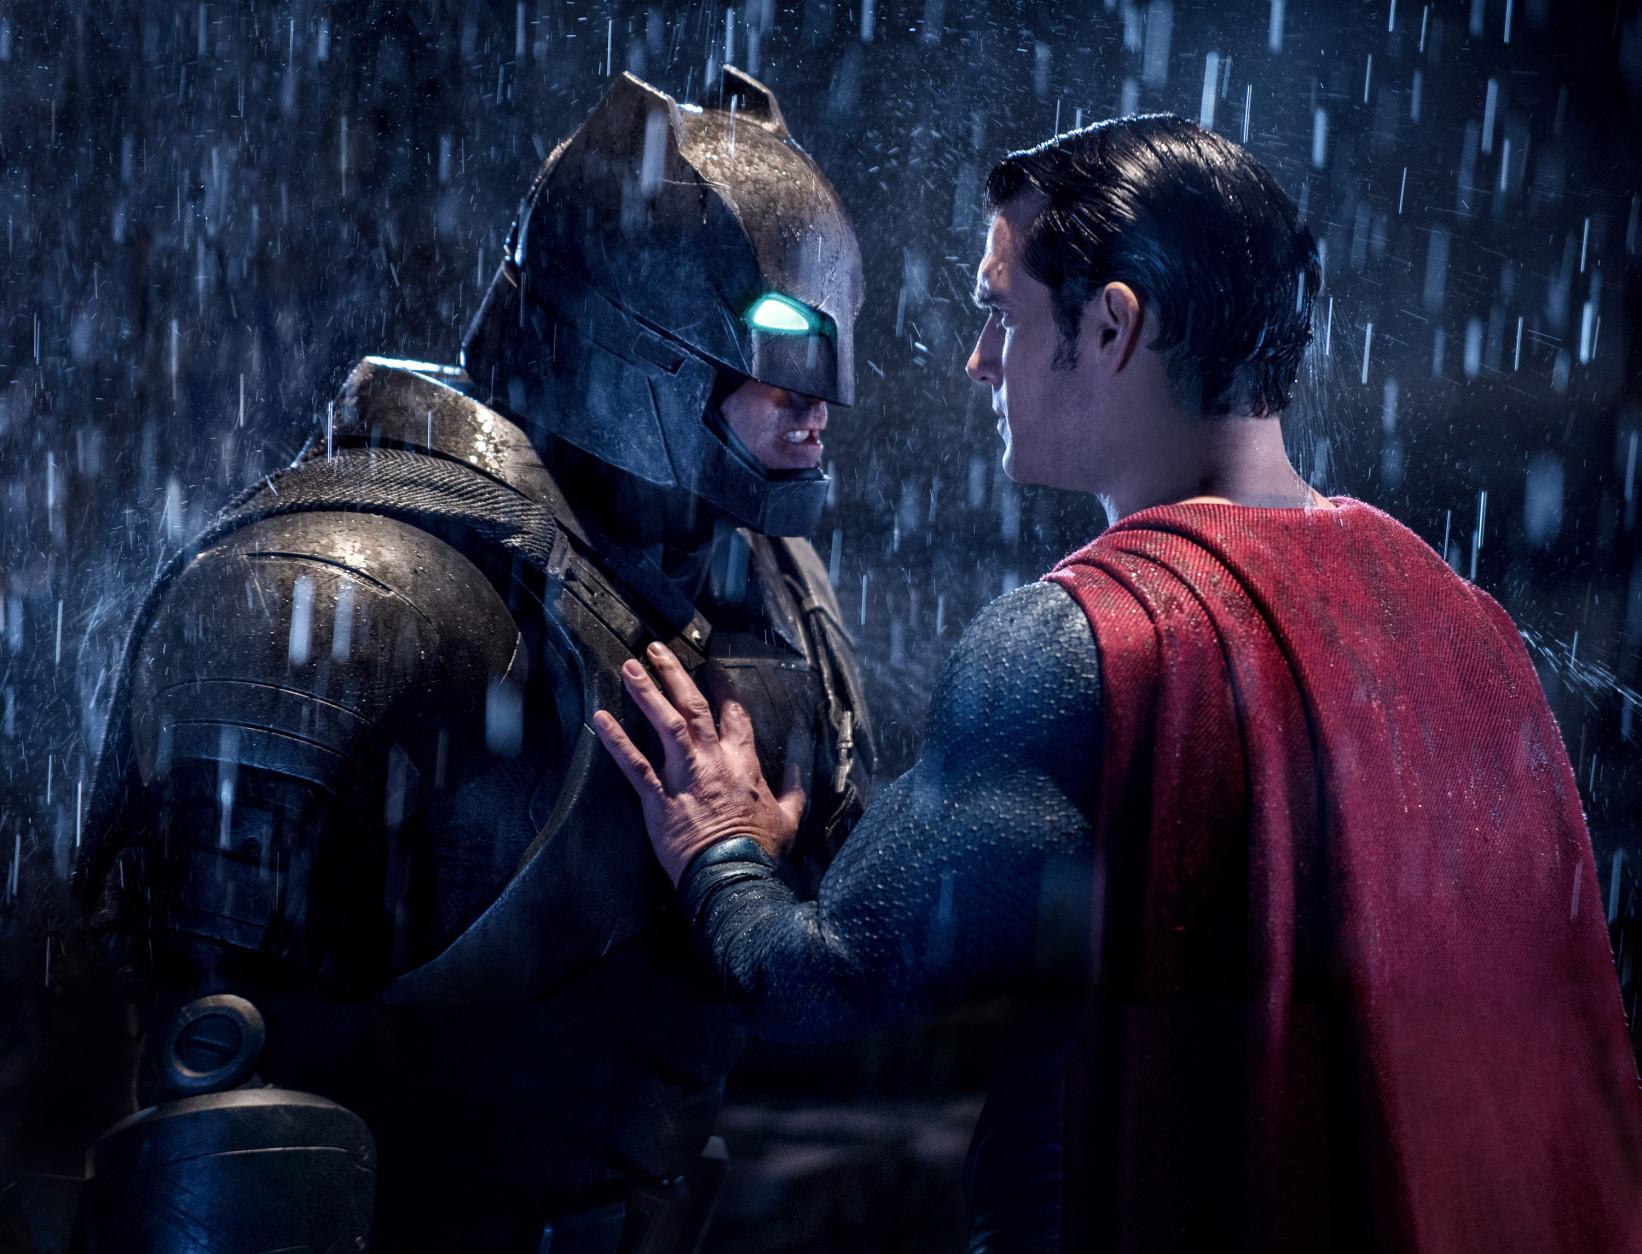 'Batman v Superman' proves we've reached Peak Superhero